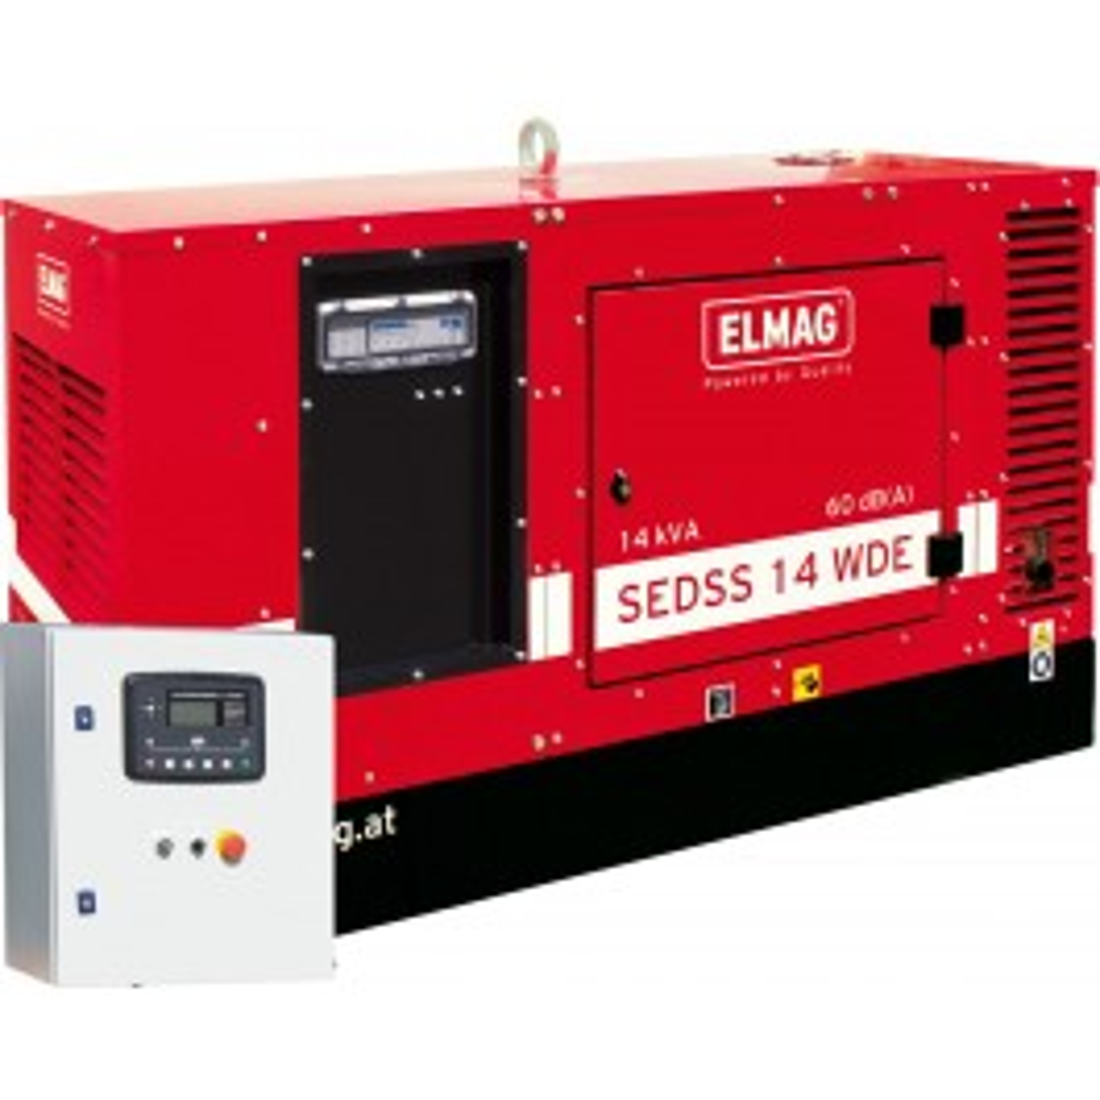 Emergency power package SEDSS 14WDE-ASS